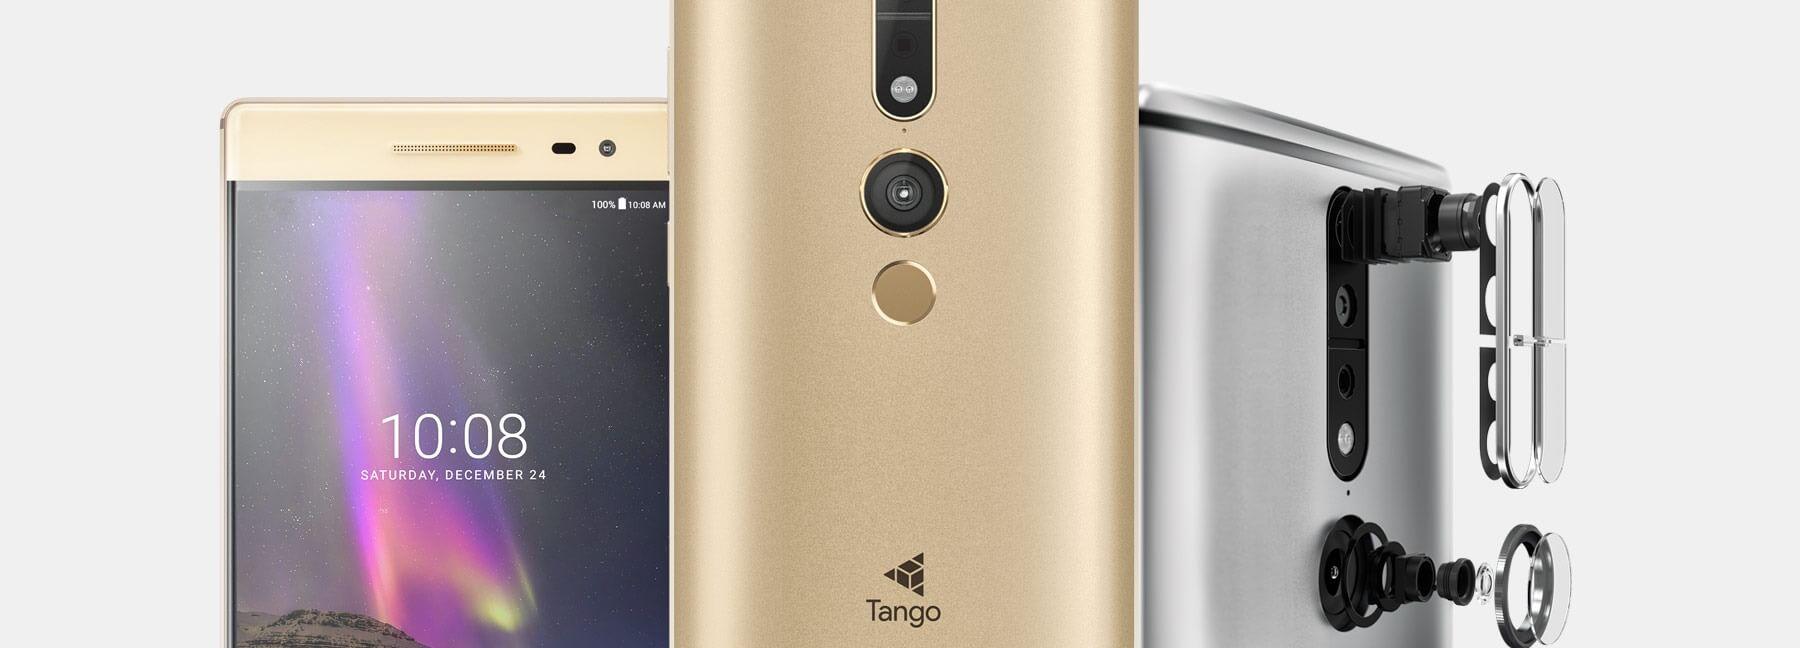 Lenovo Phab2 Pro: Augmented-Reality-Smartphone kommt für 499 Euro ...